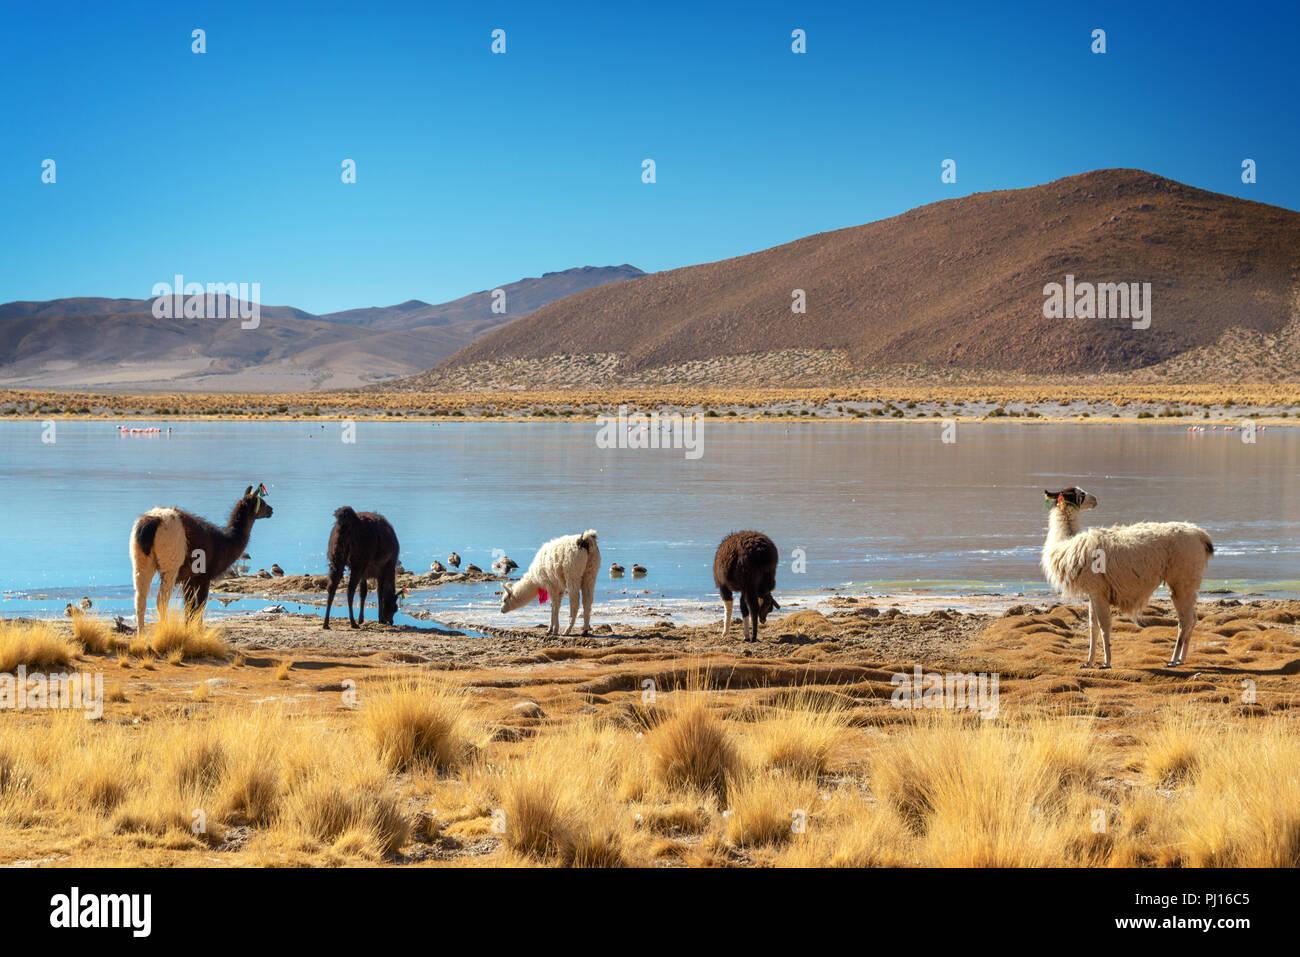 Domestic llamas grazing near a lake on the altiplano in Bolivia - Stock Image